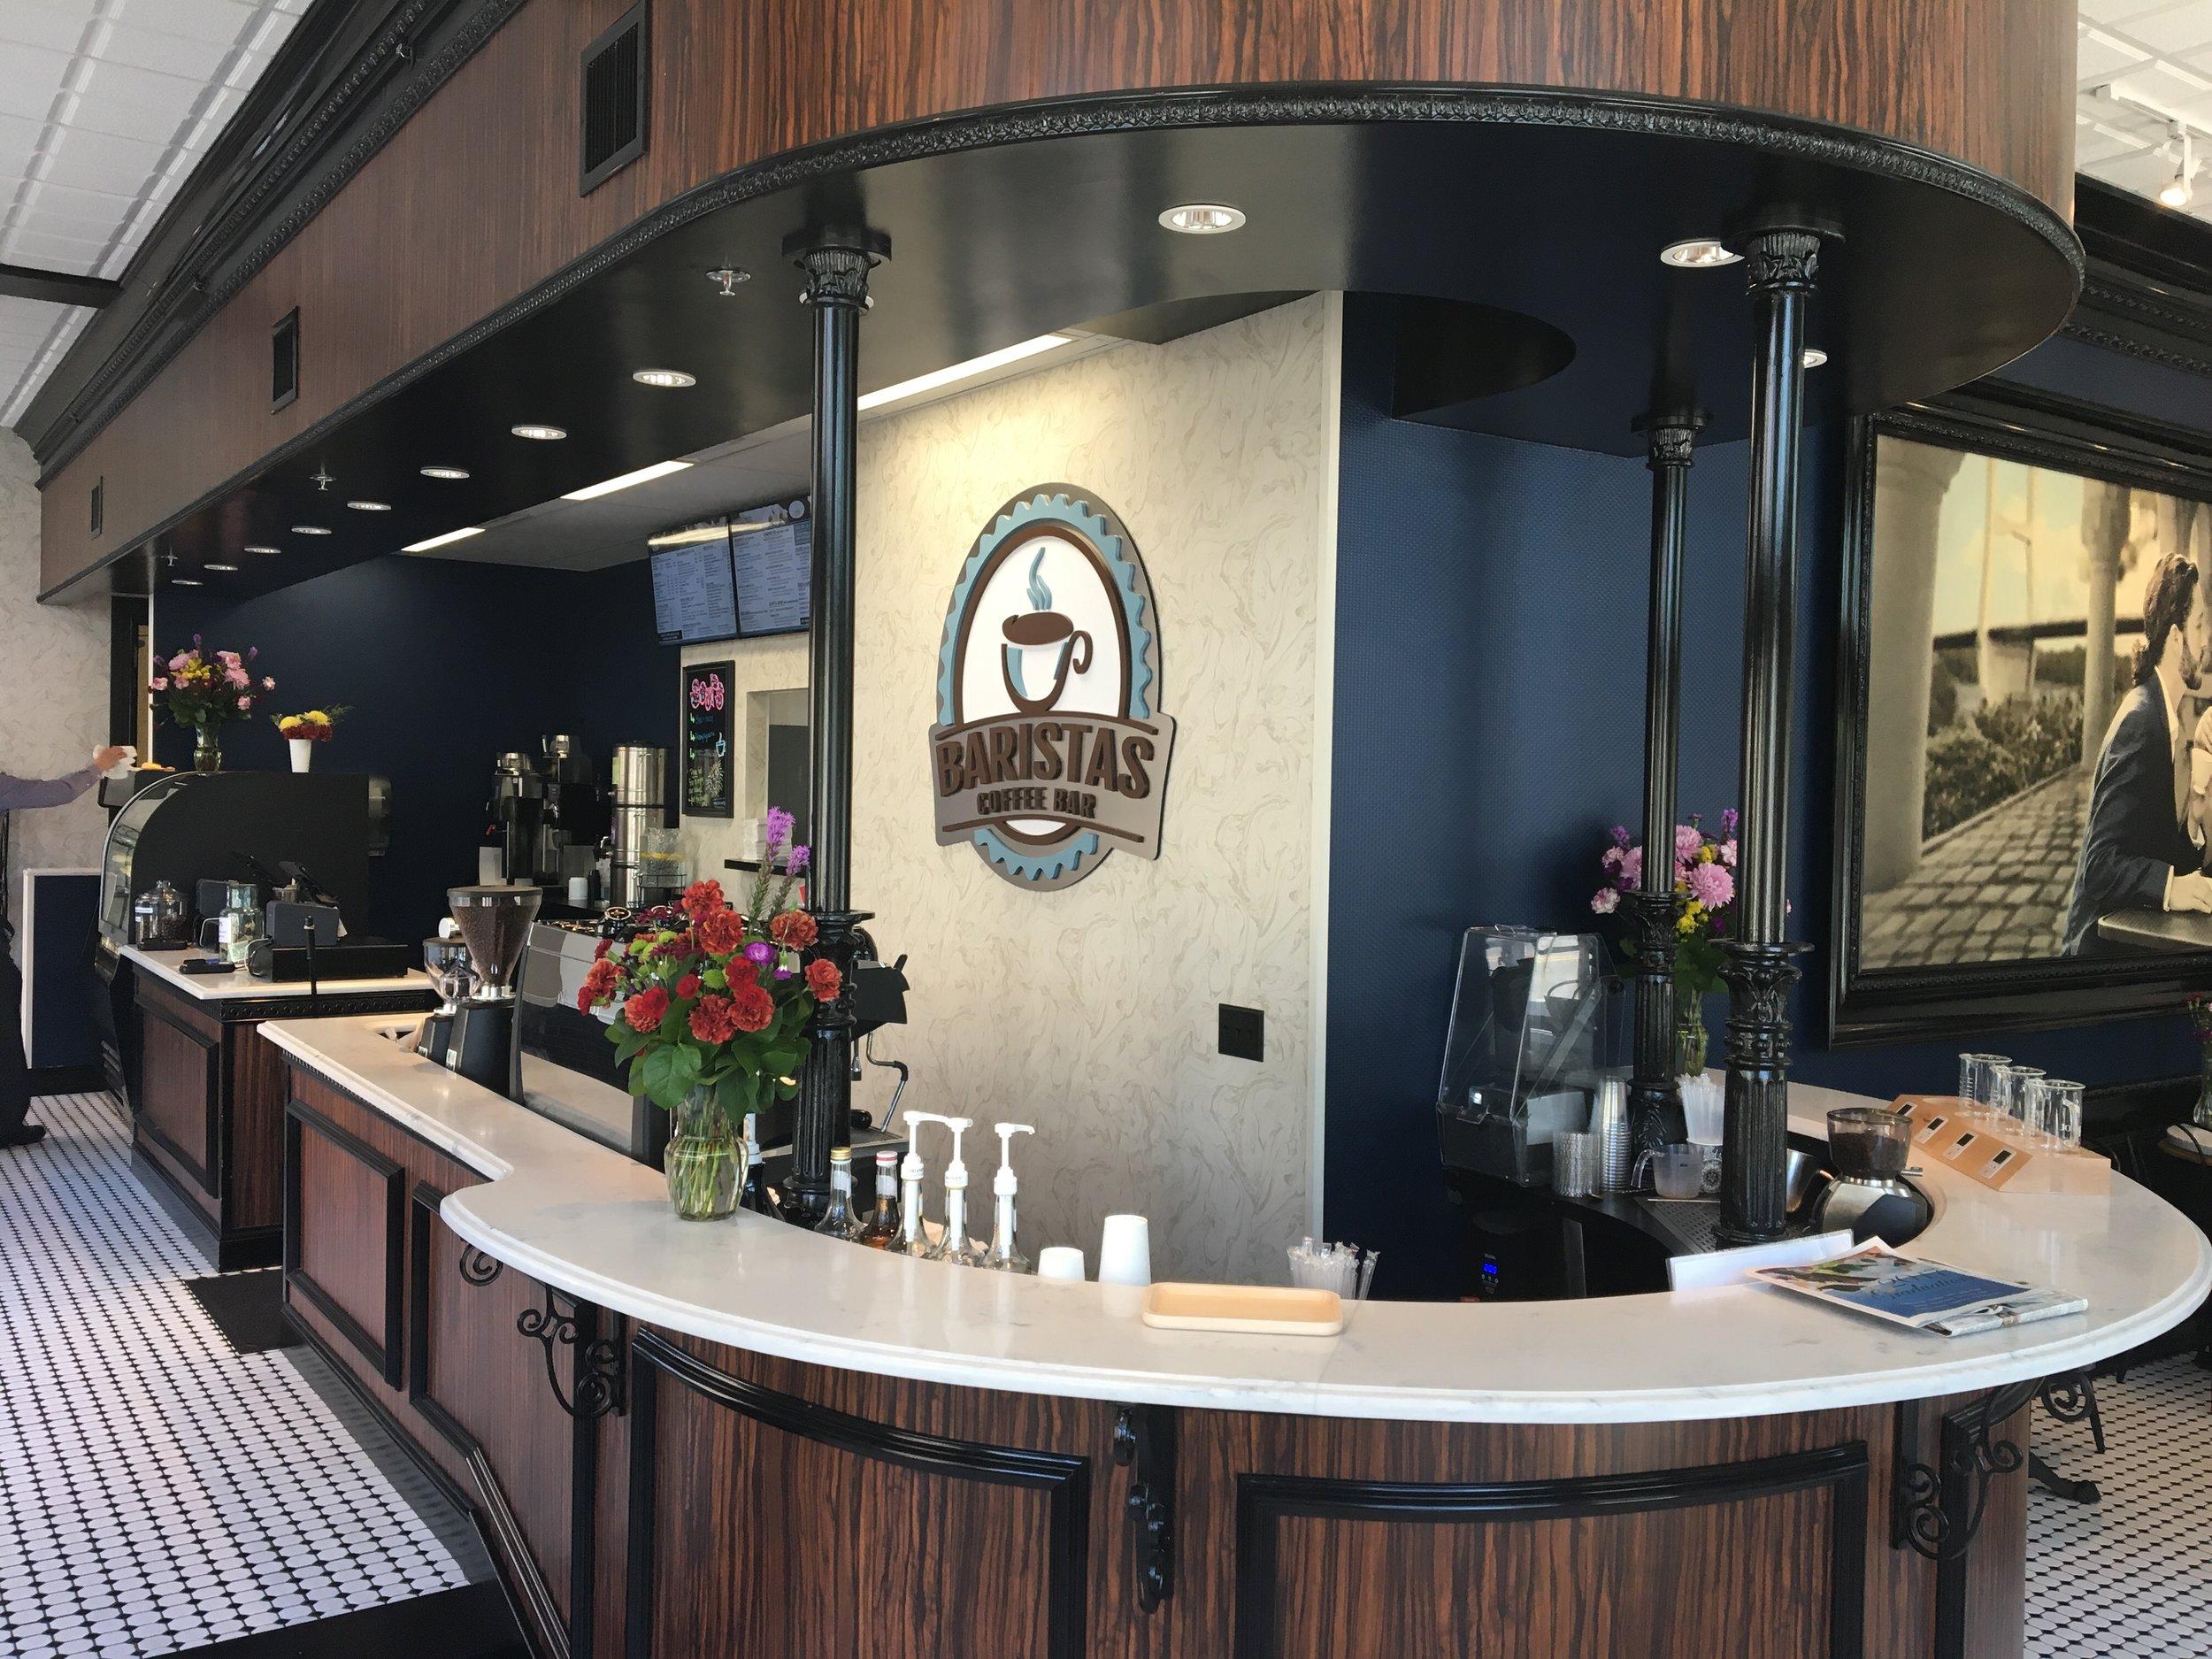 Baristas Coffee Bar - Cape Girardeau, Missouri